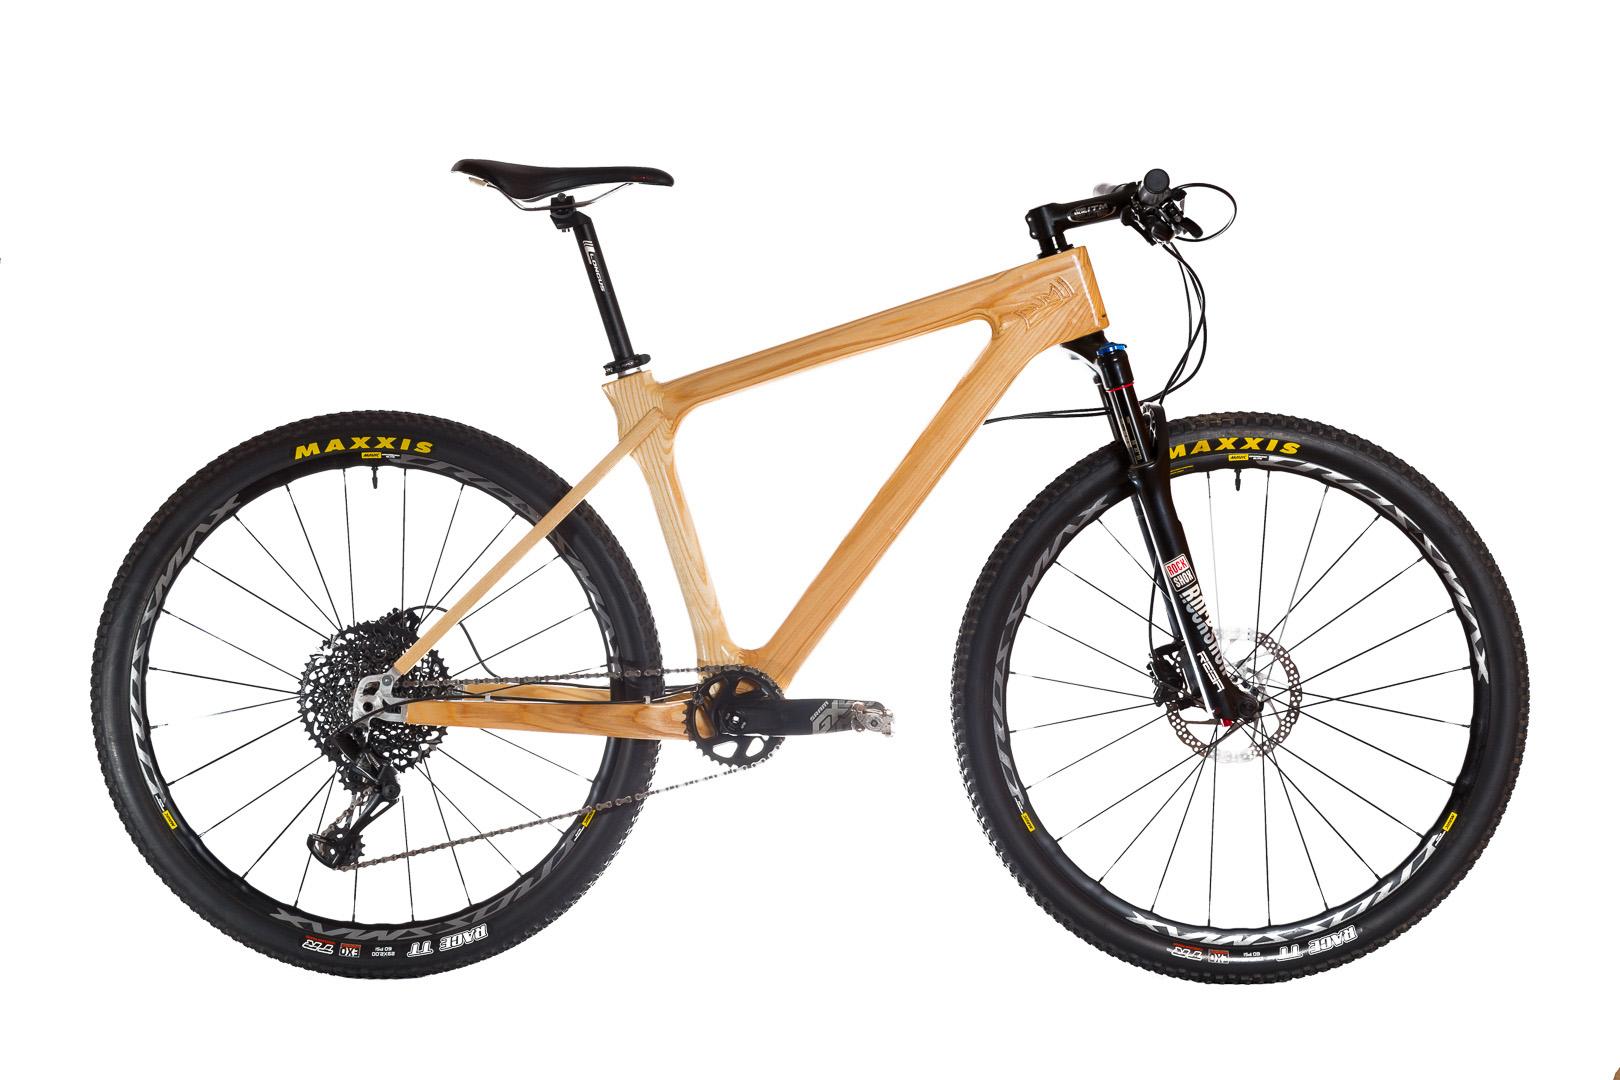 Wooden Explorer 29 Boost